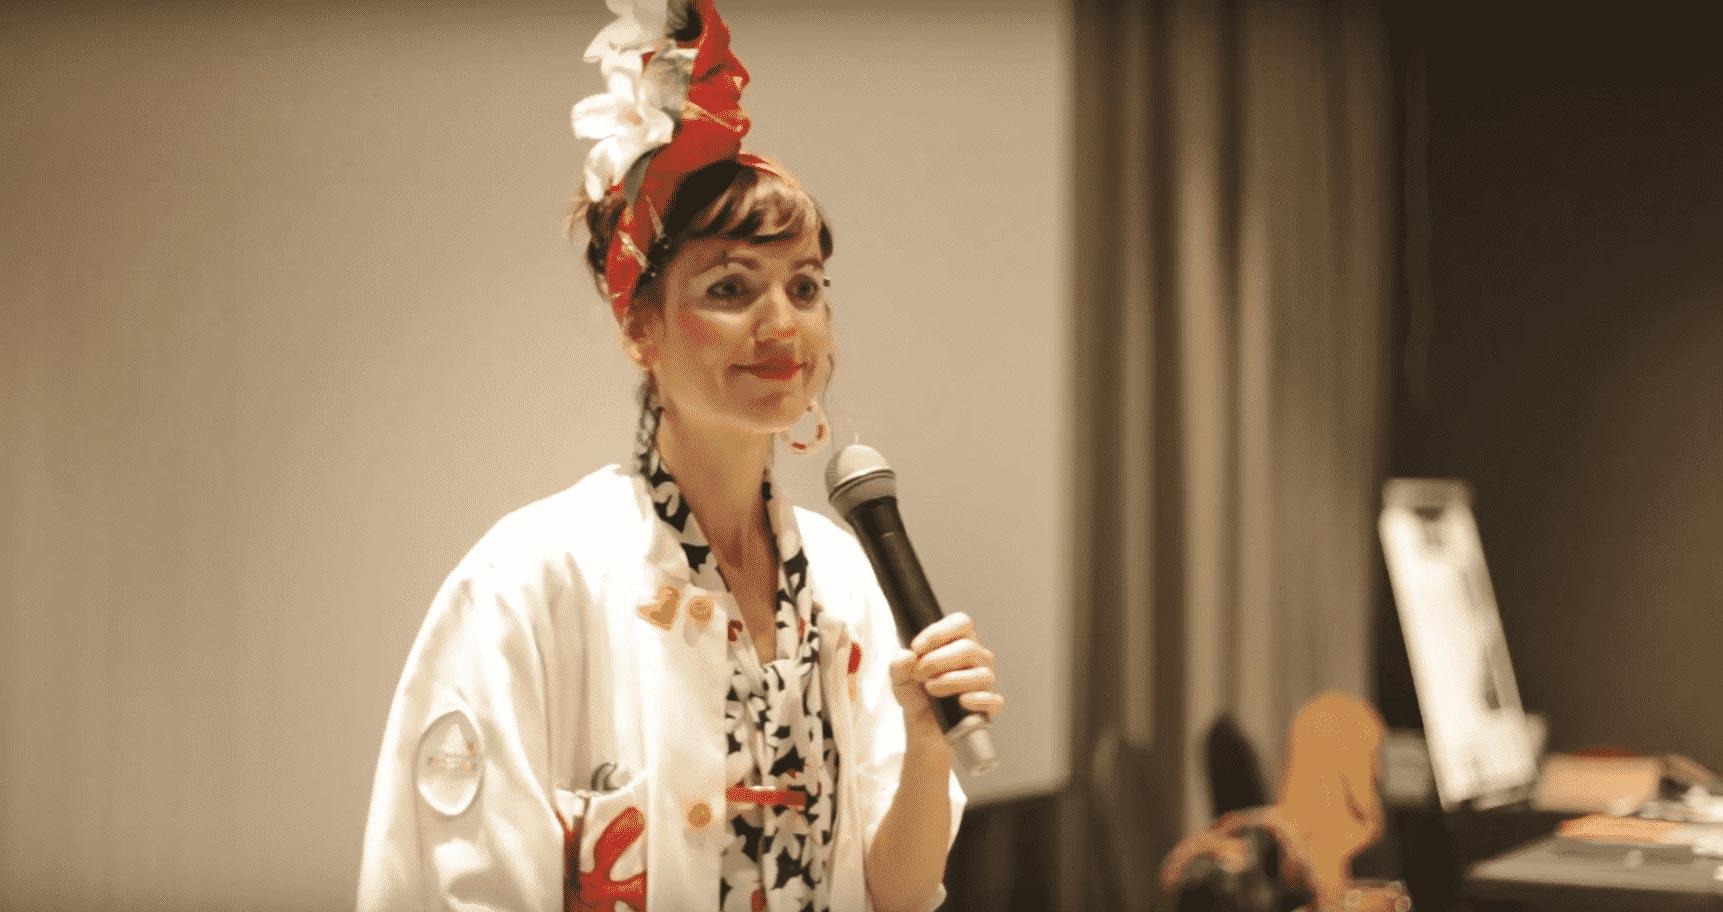 Speaker from Theodora Foundation